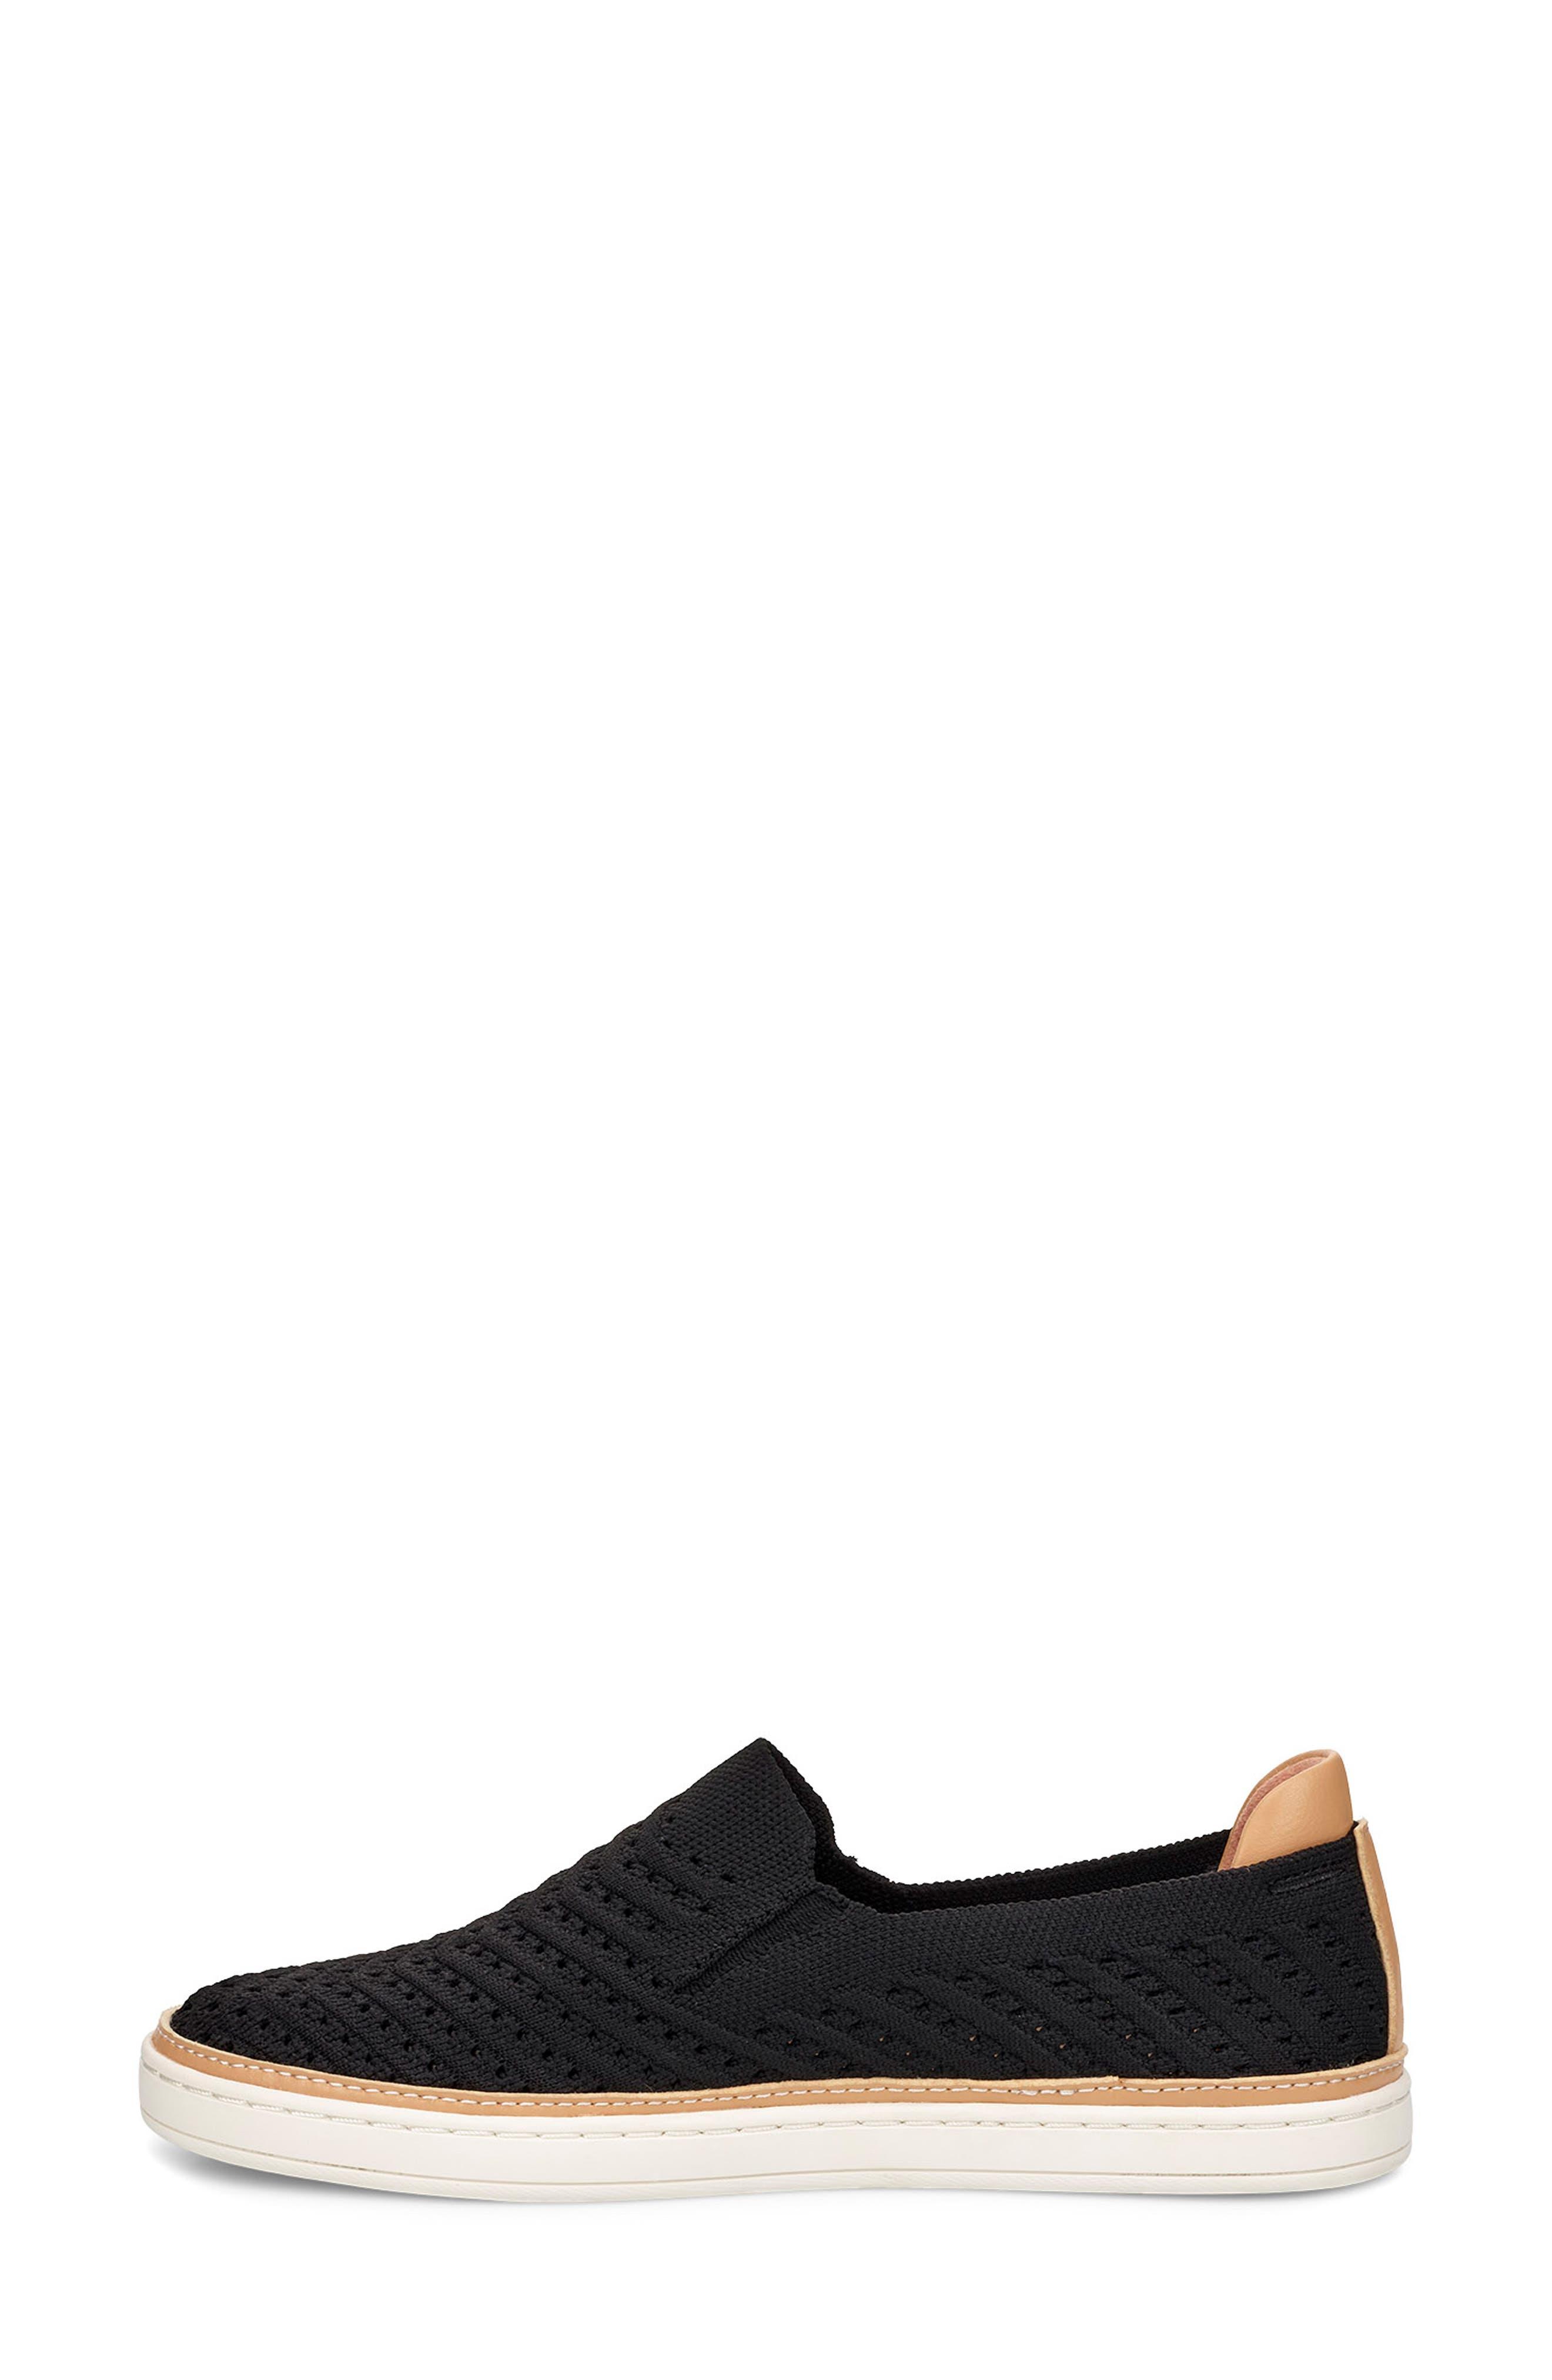 UGG<SUP>®</SUP>, Sammy Slip-On Sneaker, Alternate thumbnail 6, color, BLACK FABRIC